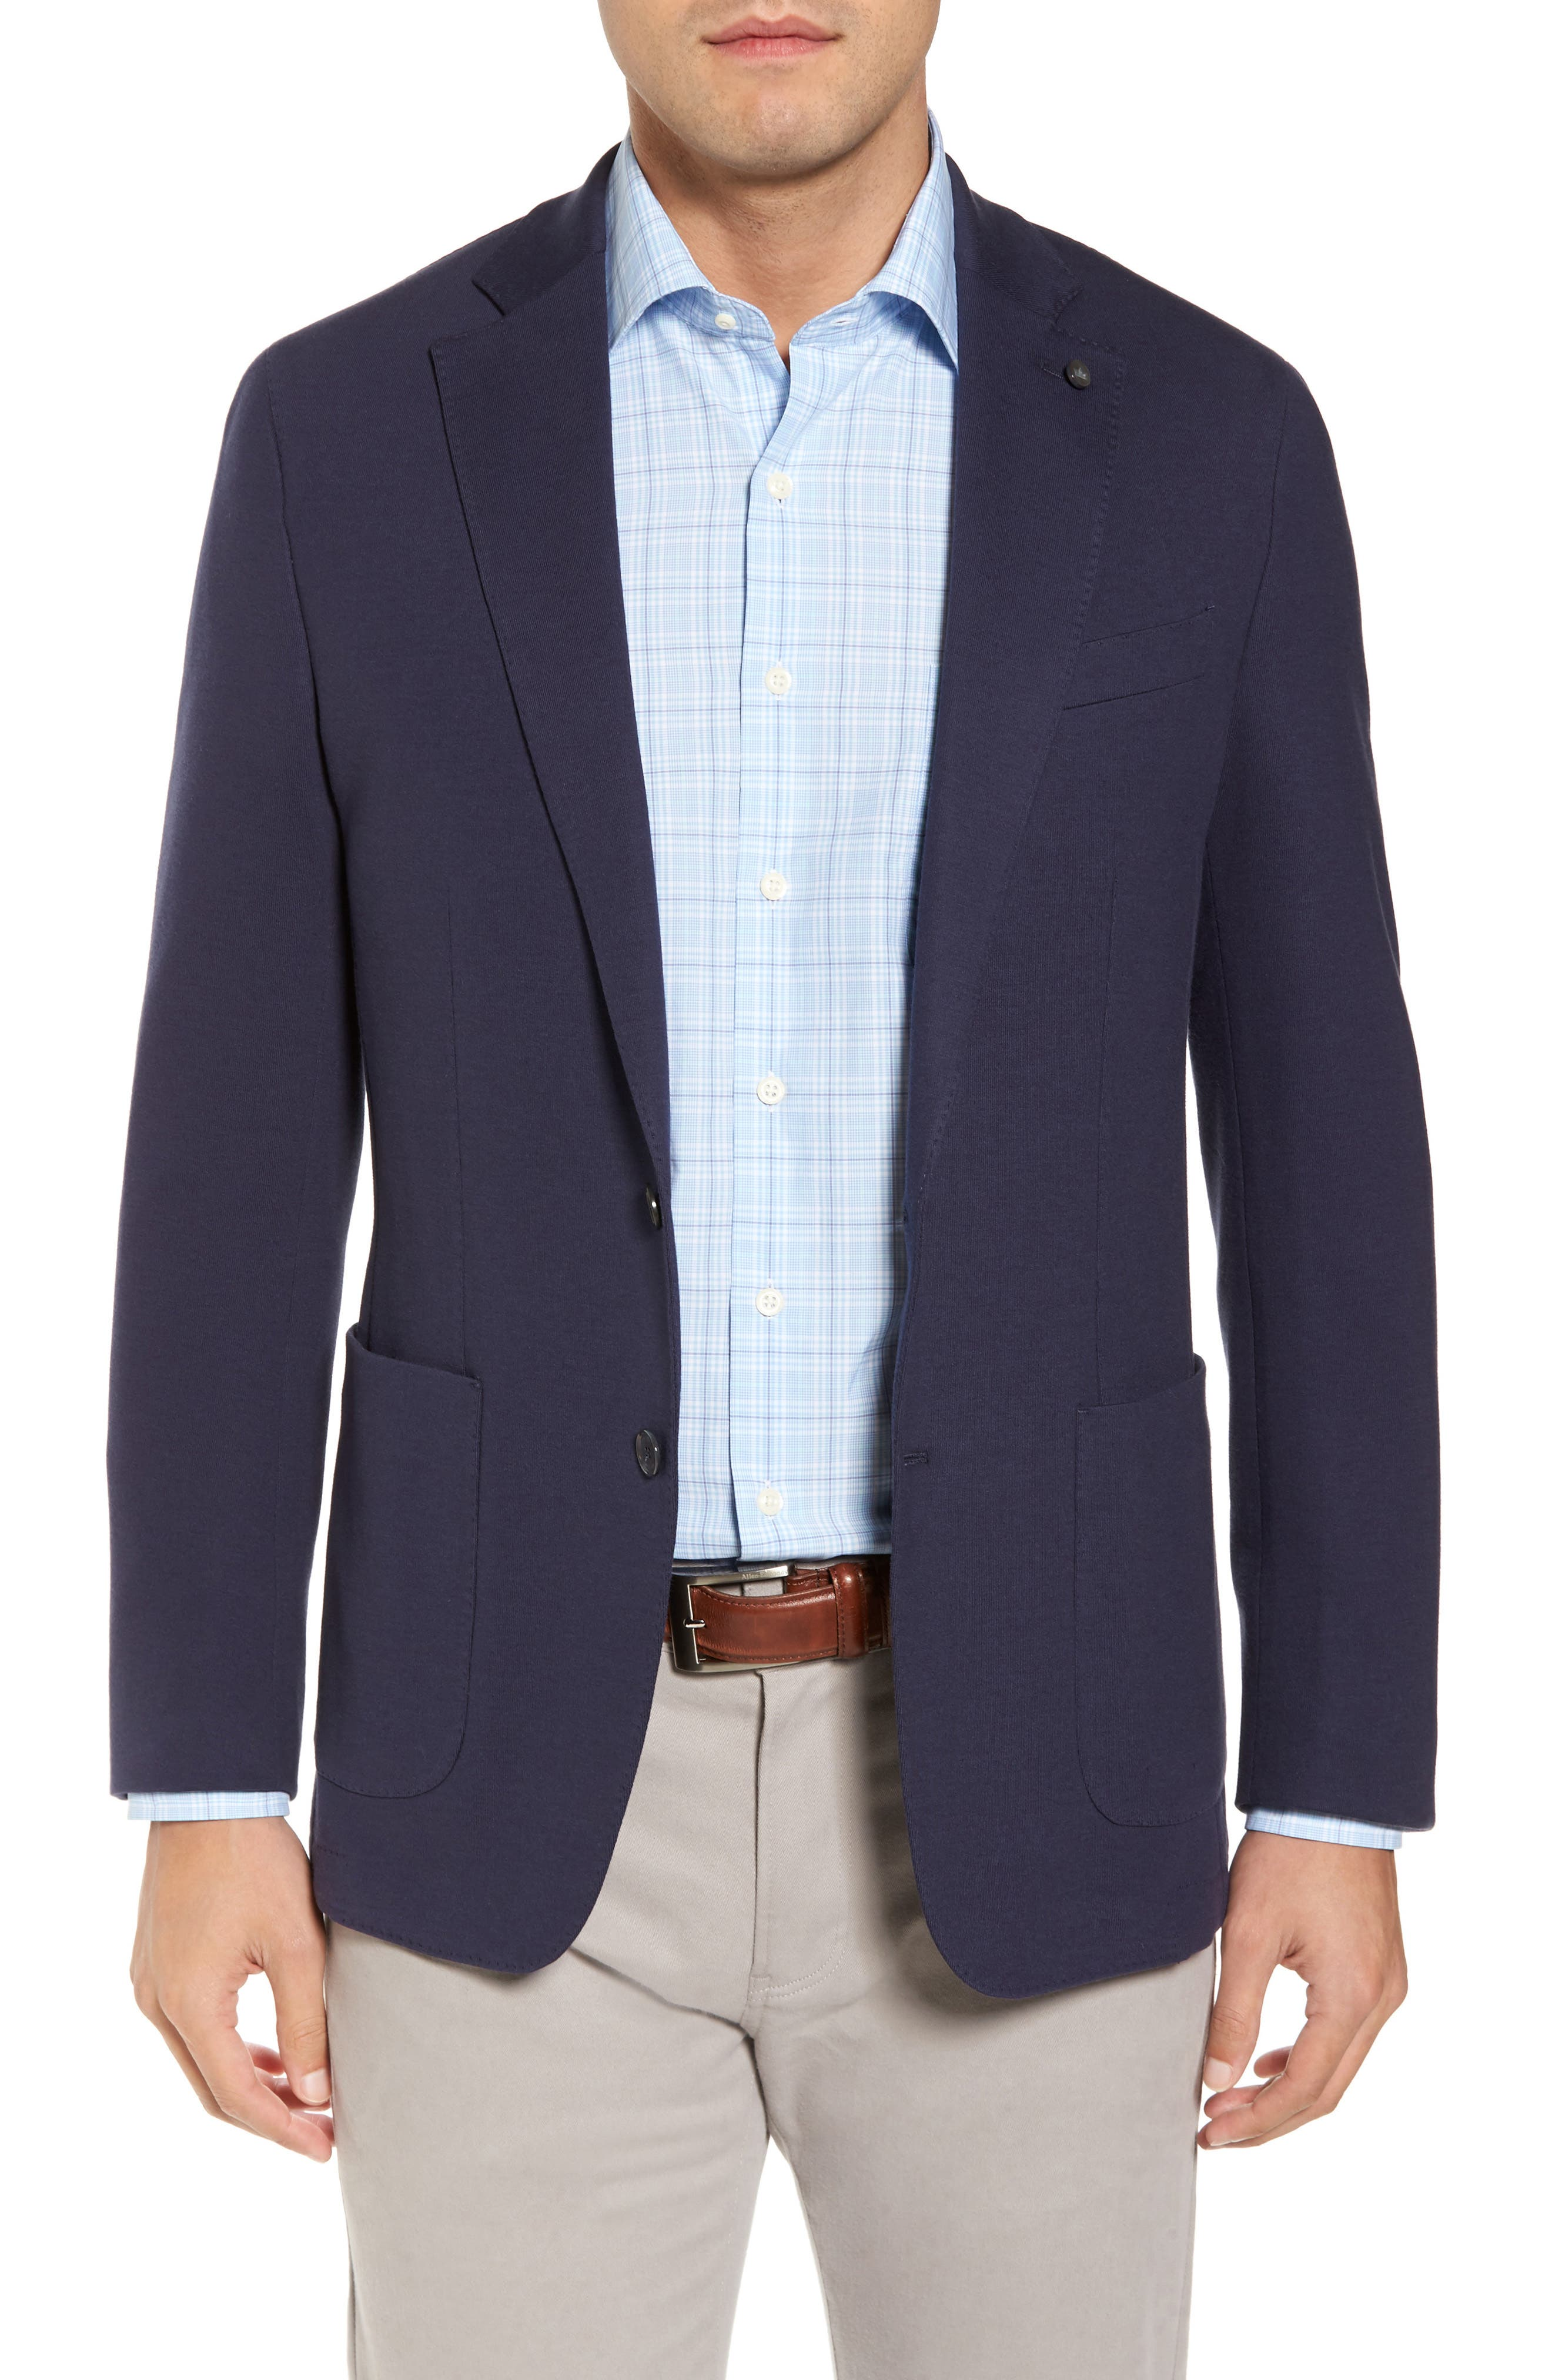 Santorini Jersey Knit Jacket,                             Main thumbnail 1, color,                             417